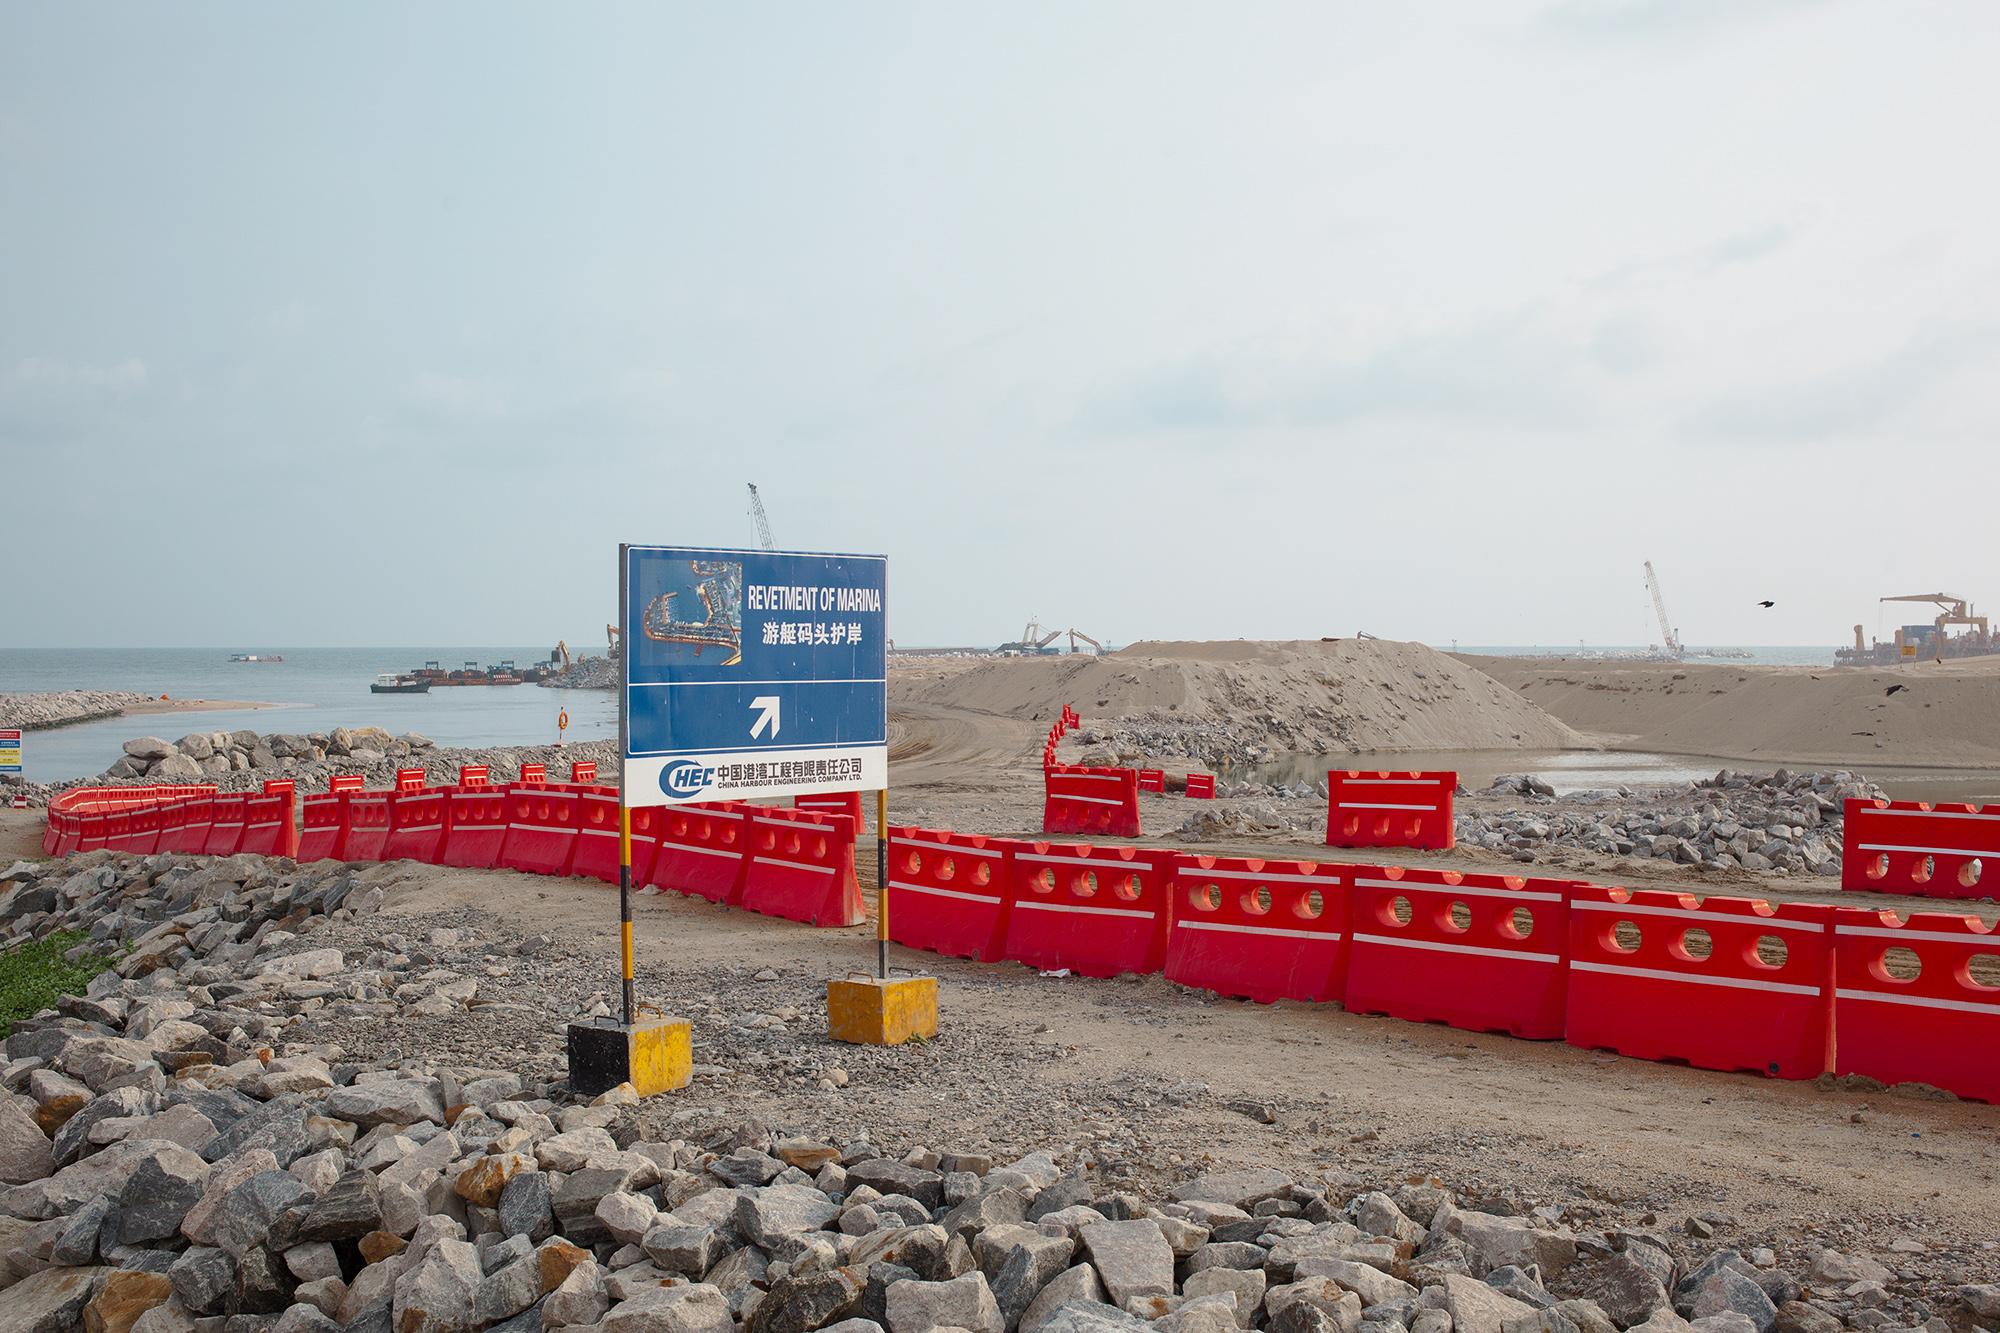 A China Harbour Engineering Company construction site, Colombo, Sri Lanka, 2017.